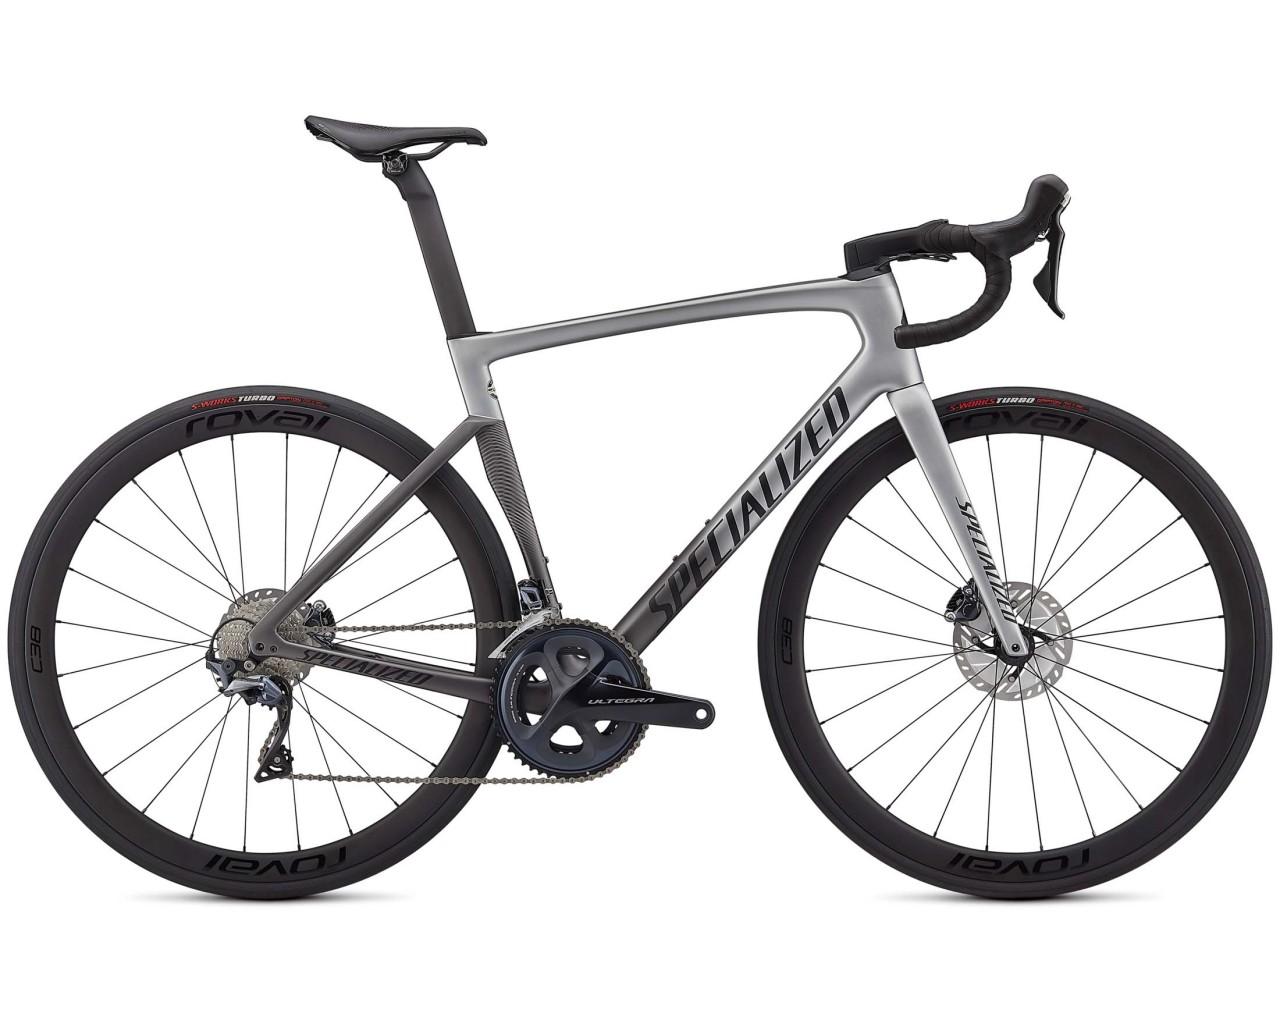 Specialized Tarmac SL7 Expert - Carbon Road Bike 2021 | light silver-smoke fade-black